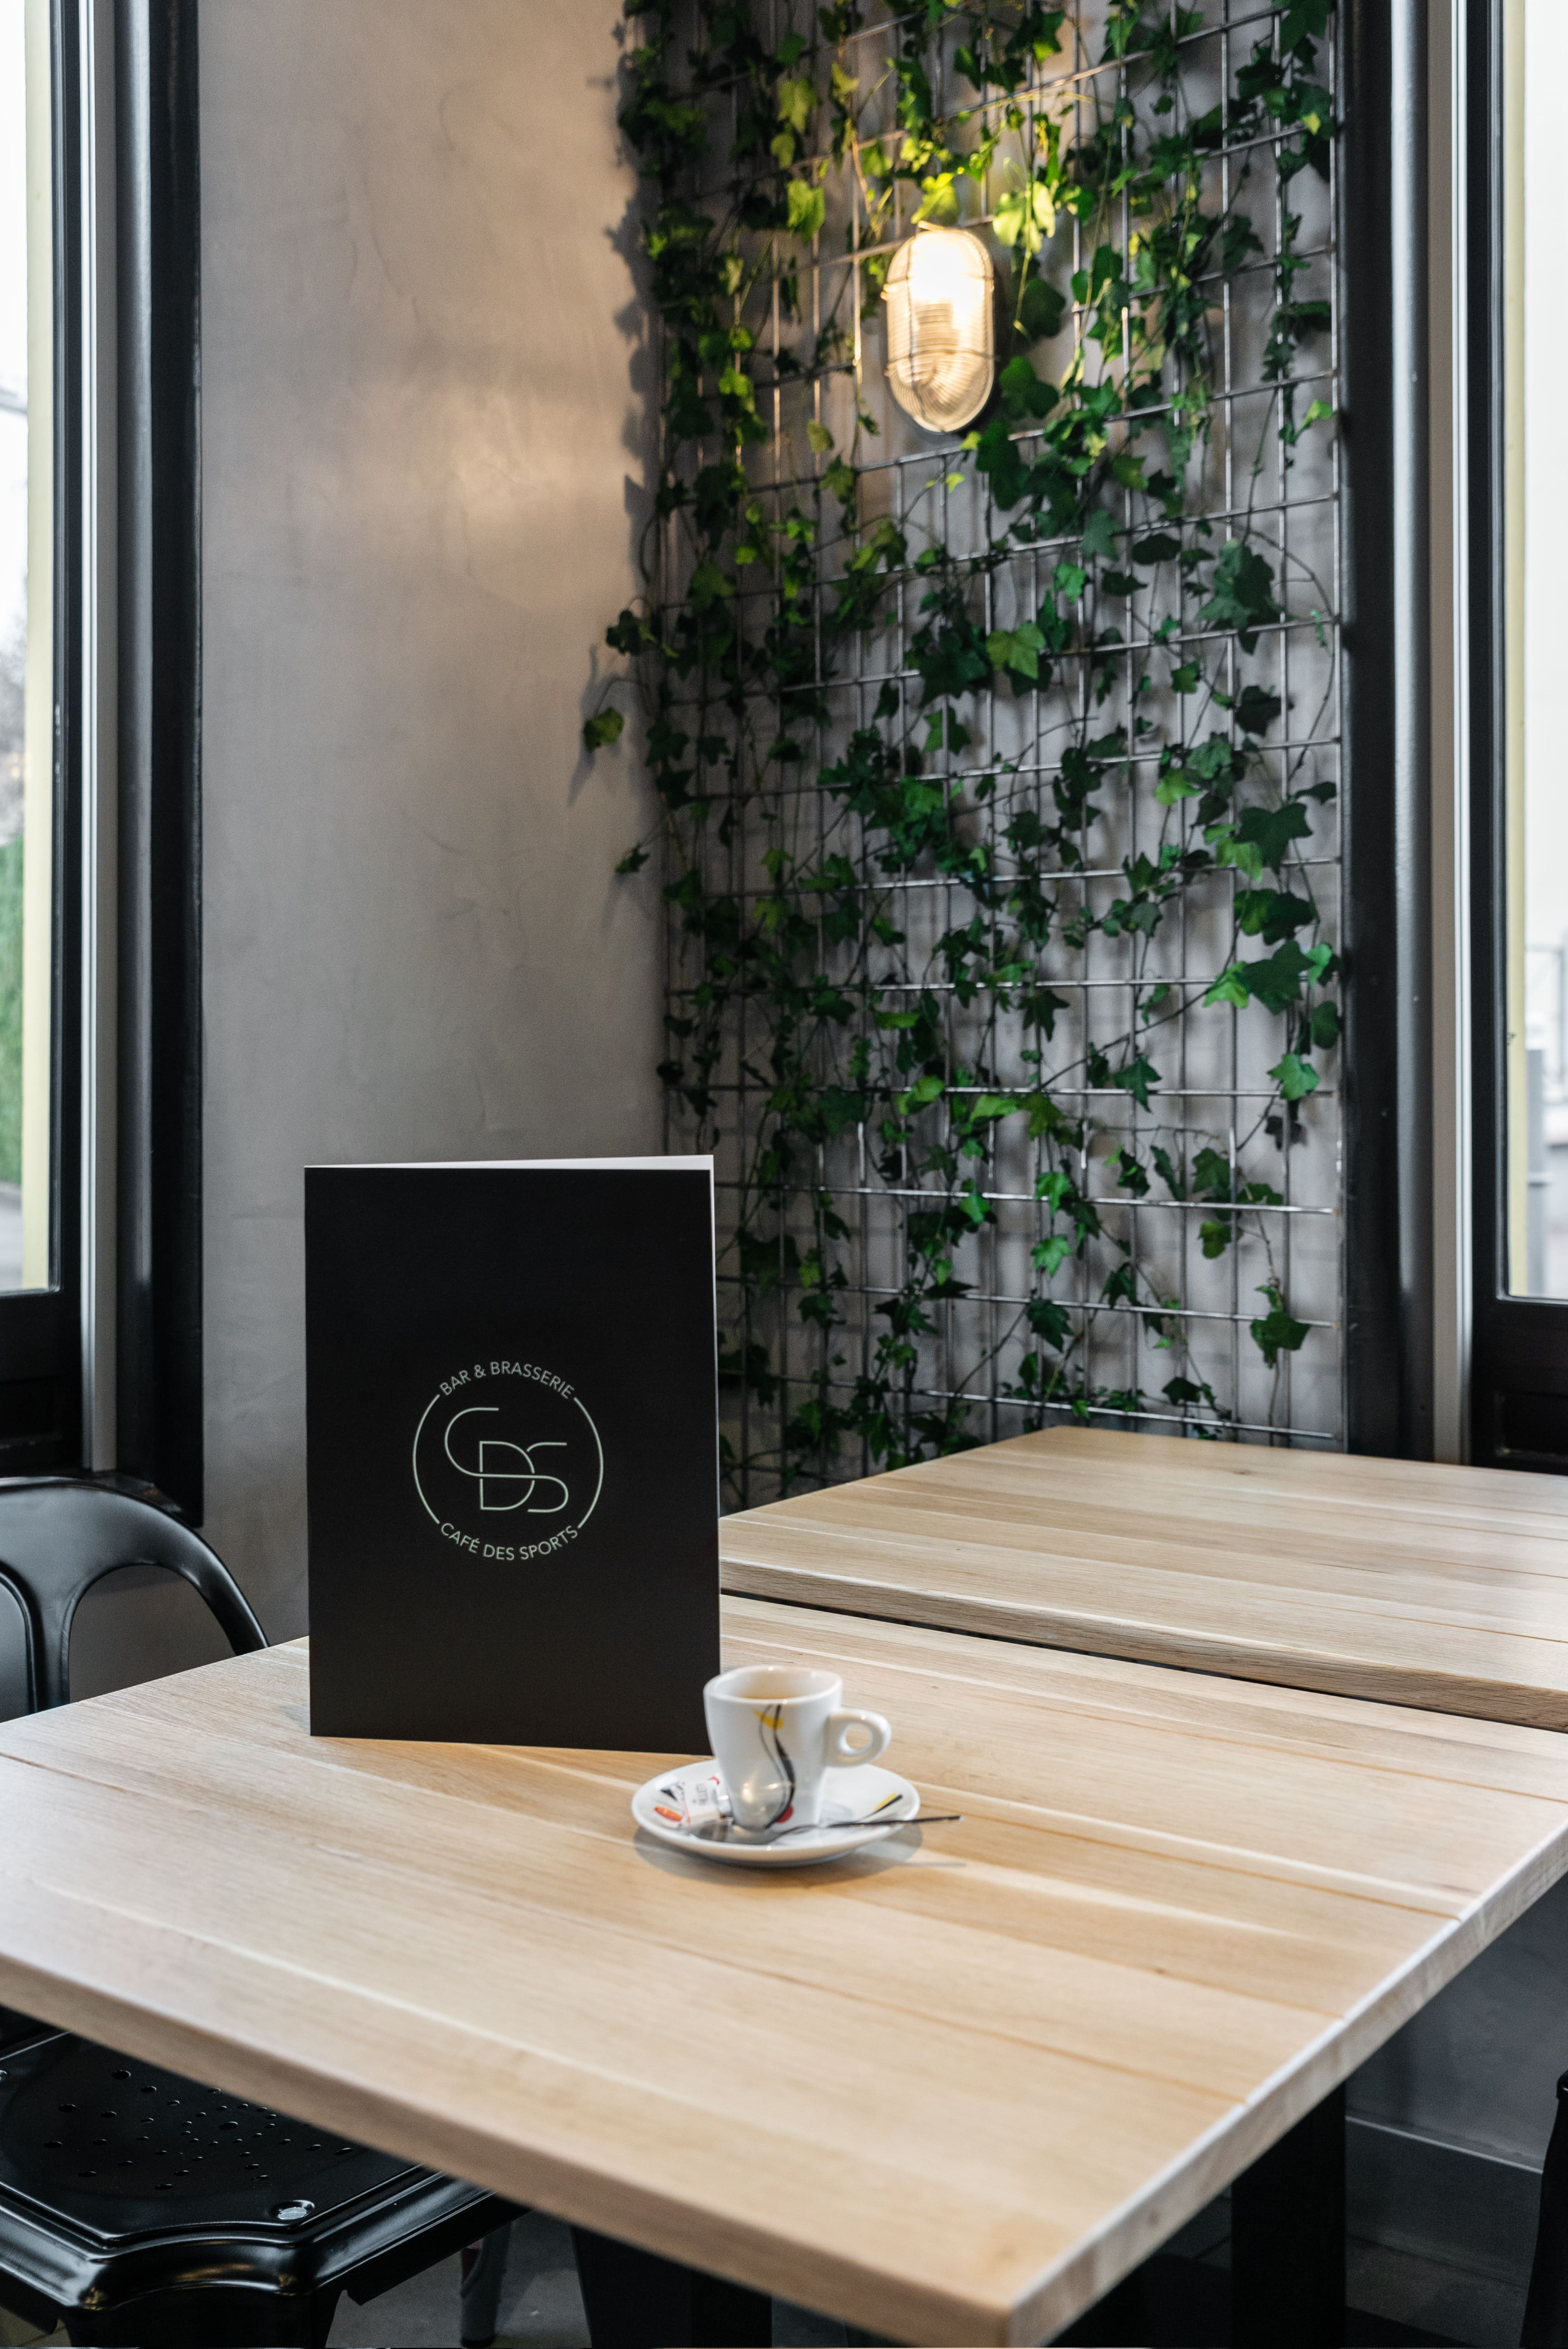 robi design metallique Annecy Cafe des sports Rumilly Le Mesle Photographe-CDS_ESKIS_04-min